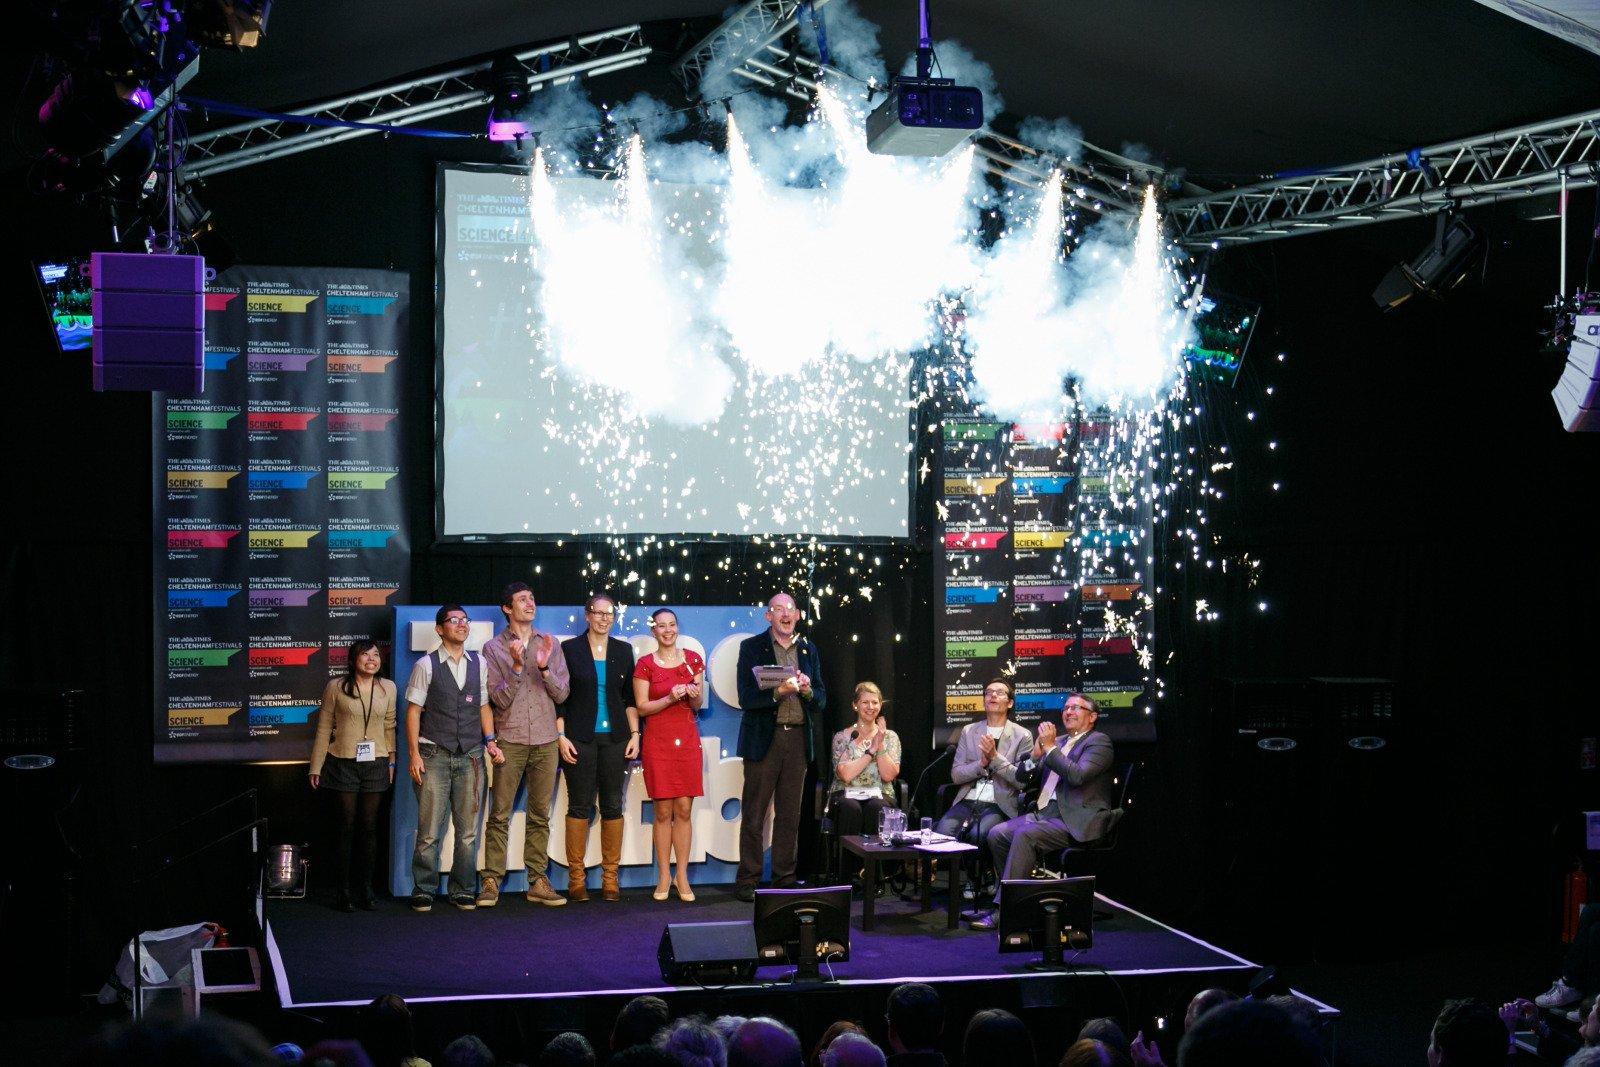 FameLab International Semi-Final 2014